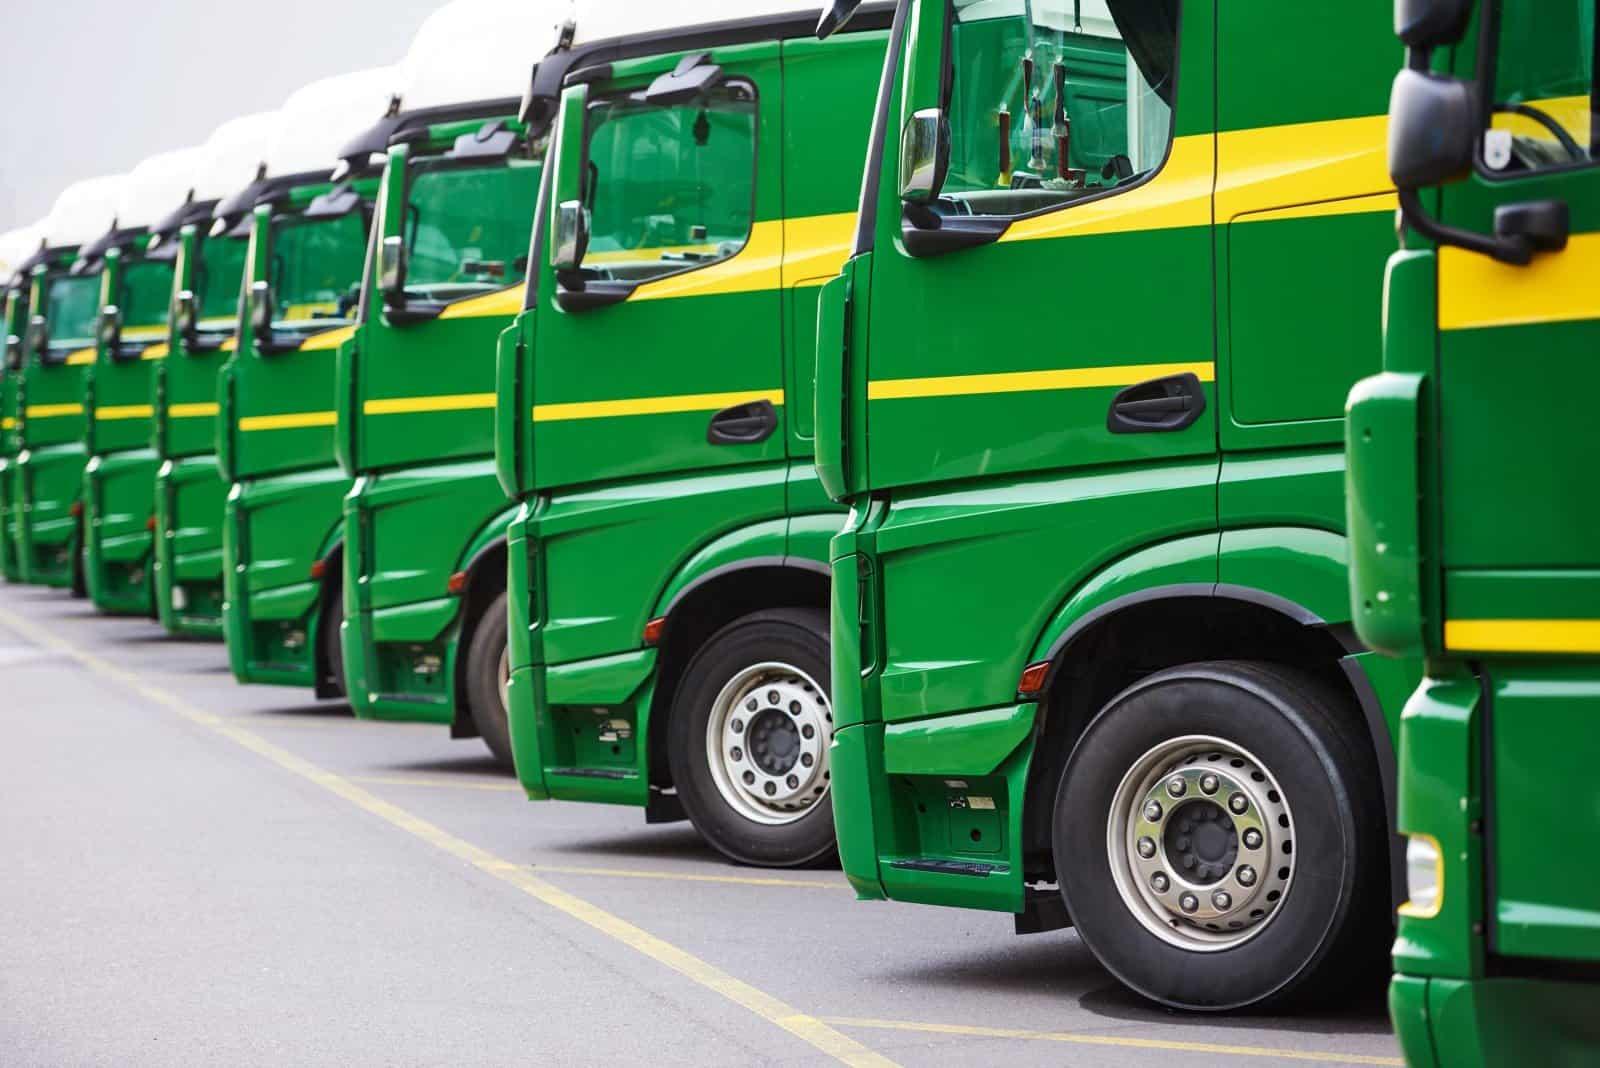 Acer Green - Truck & Van Immobiliser - Maple Fleet Services